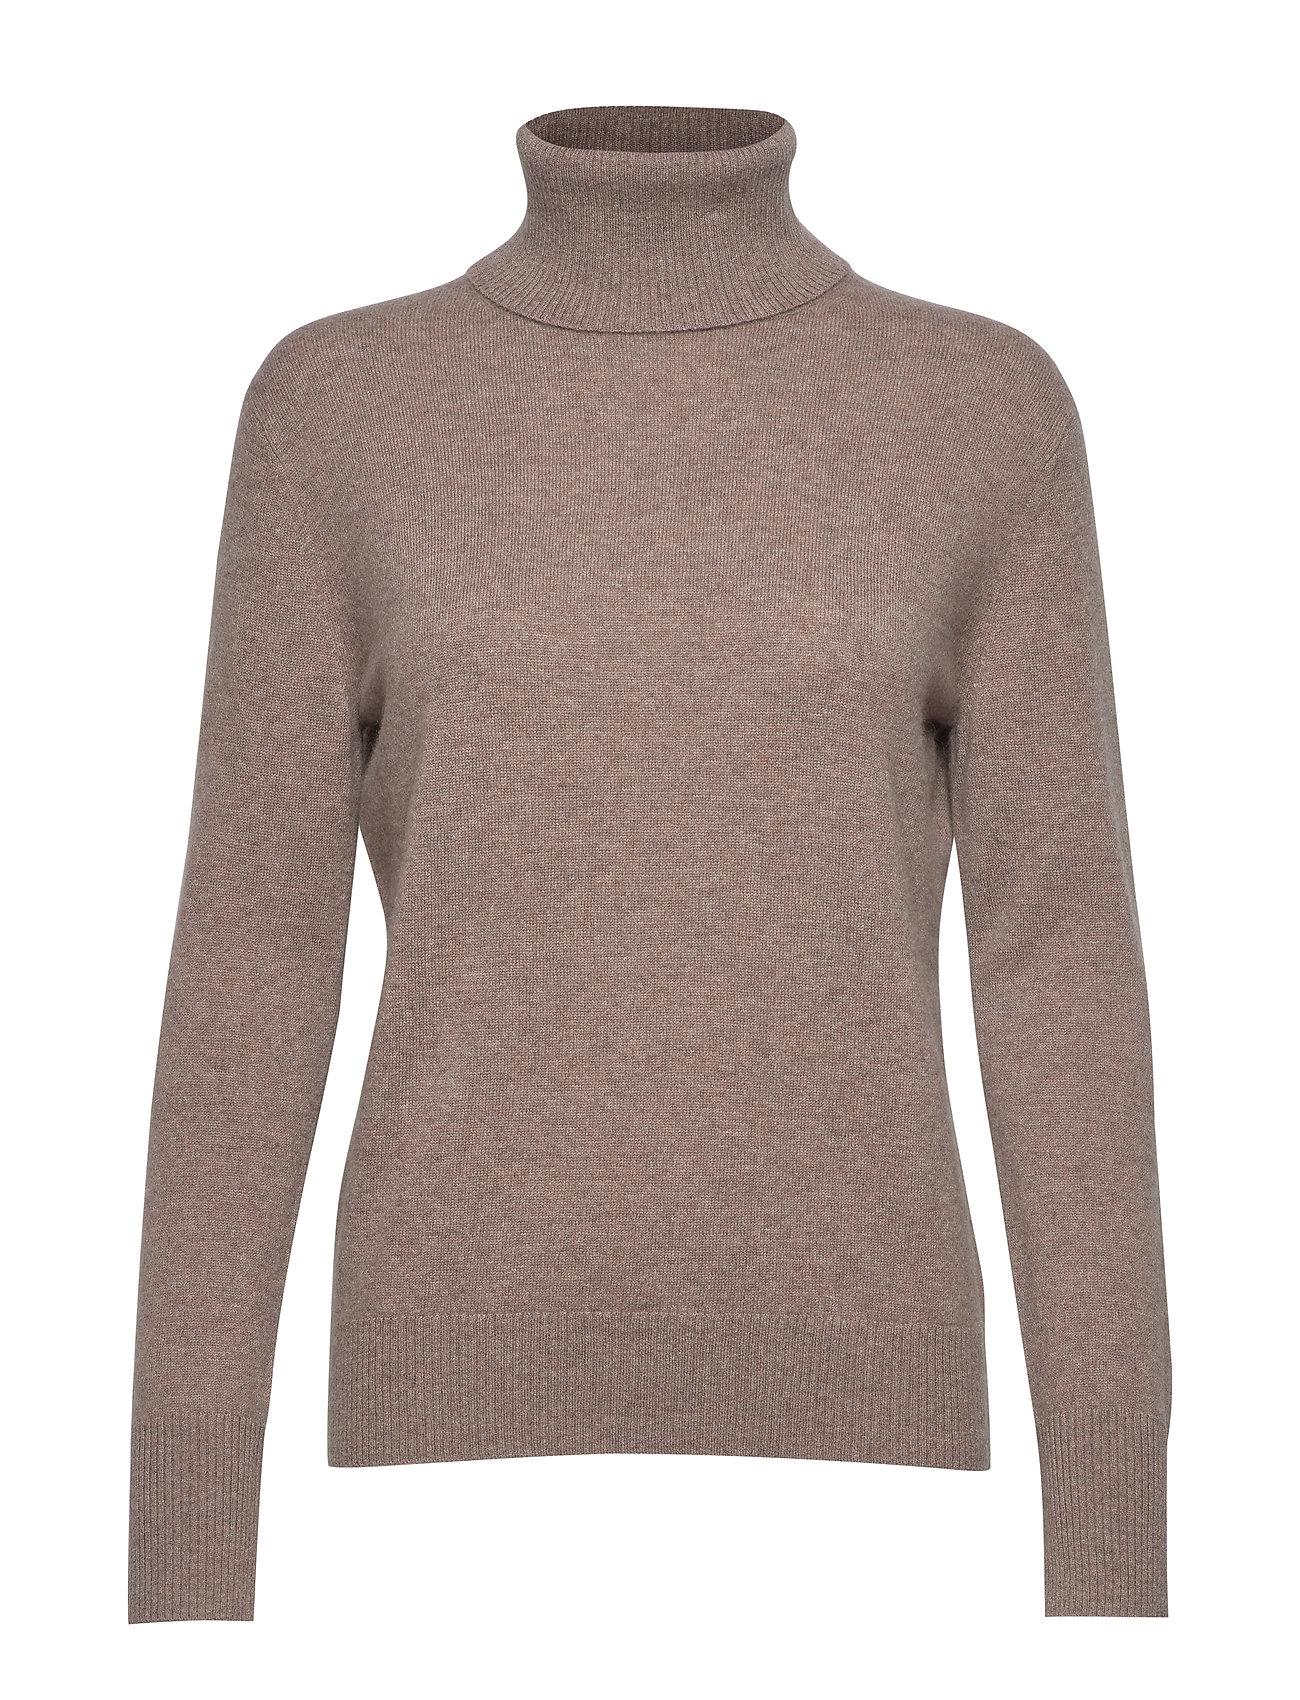 Filippa K Cashmere Roller Neck Sweater - TAUPE